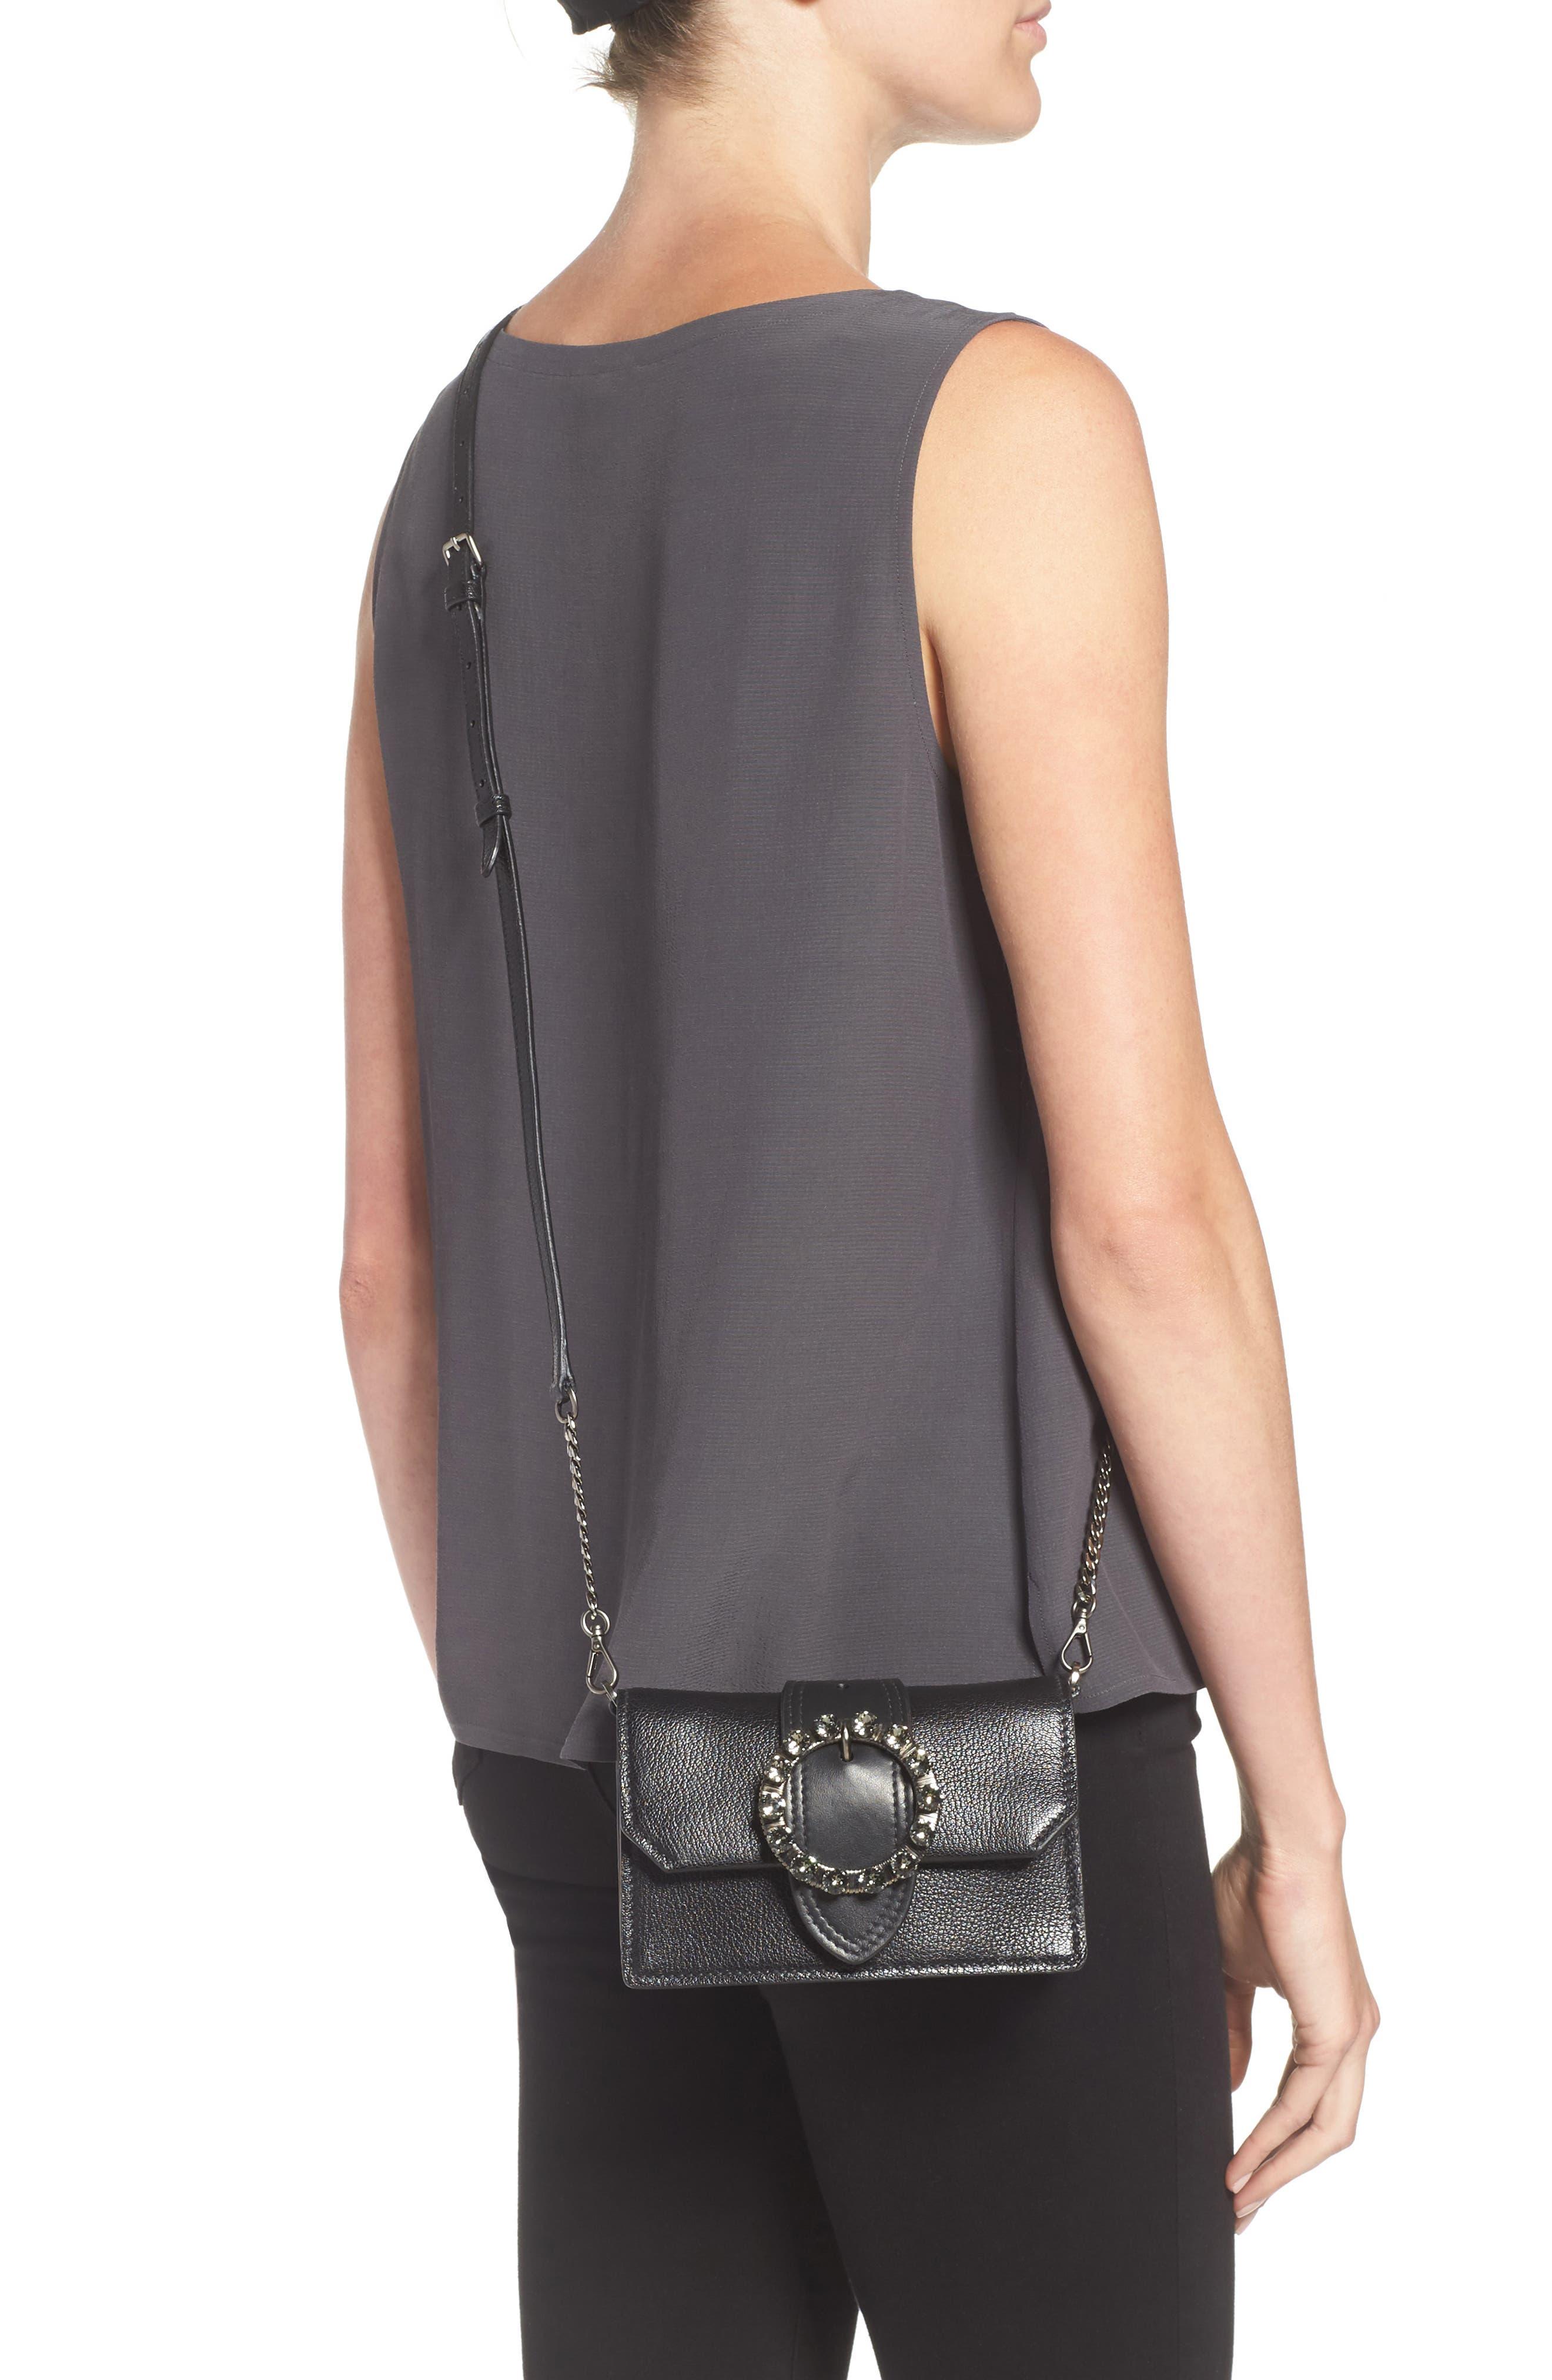 Lady Madras Crystal Embellished Leather Crossbody Bag,                             Alternate thumbnail 2, color,                             Nero 1